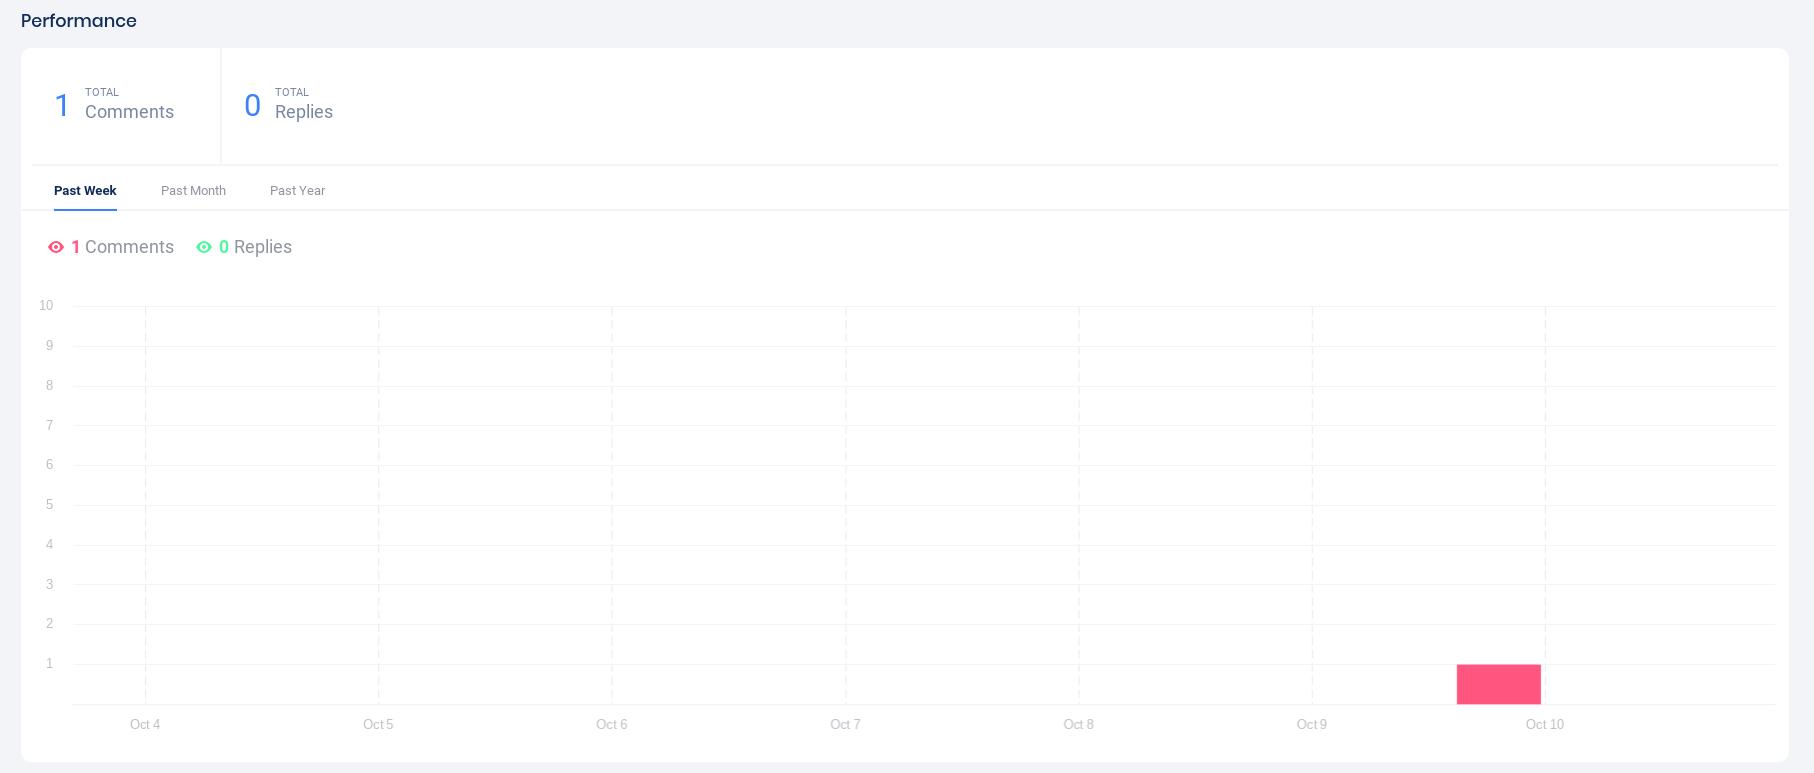 Instagram posts performance graph